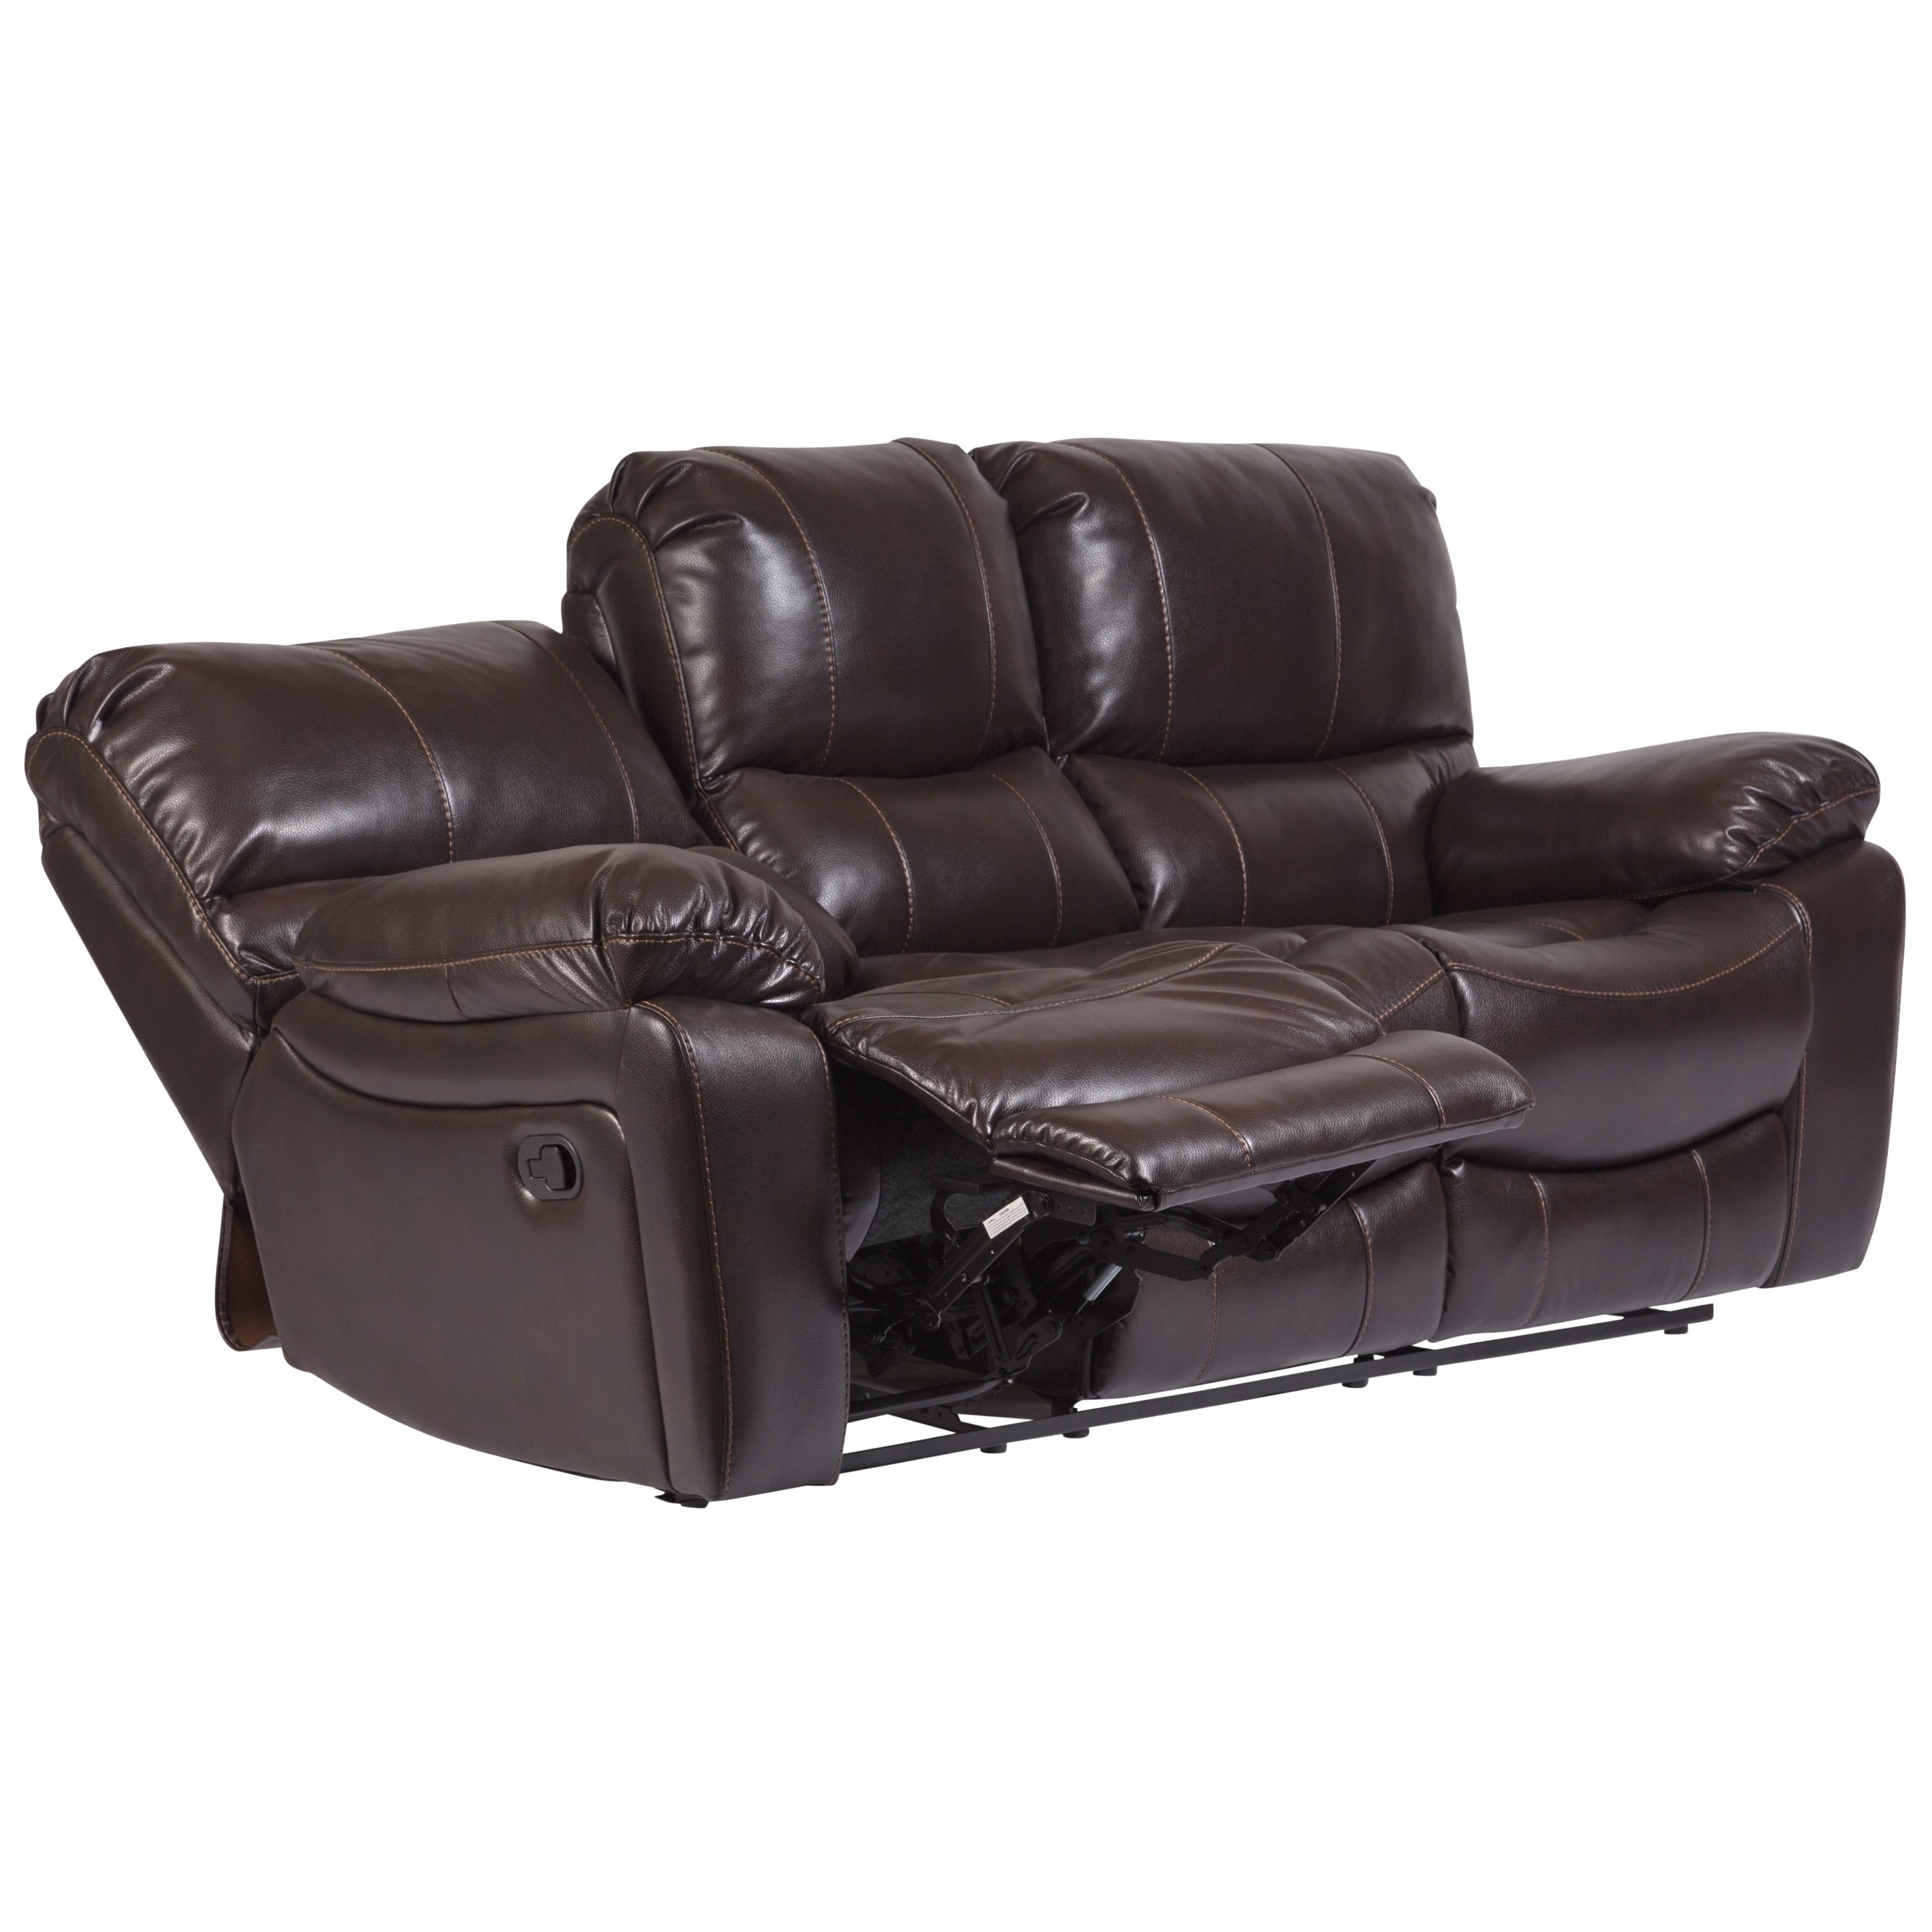 Porter Designs Ramsey Leather-Look Reclining Sofa - 40\